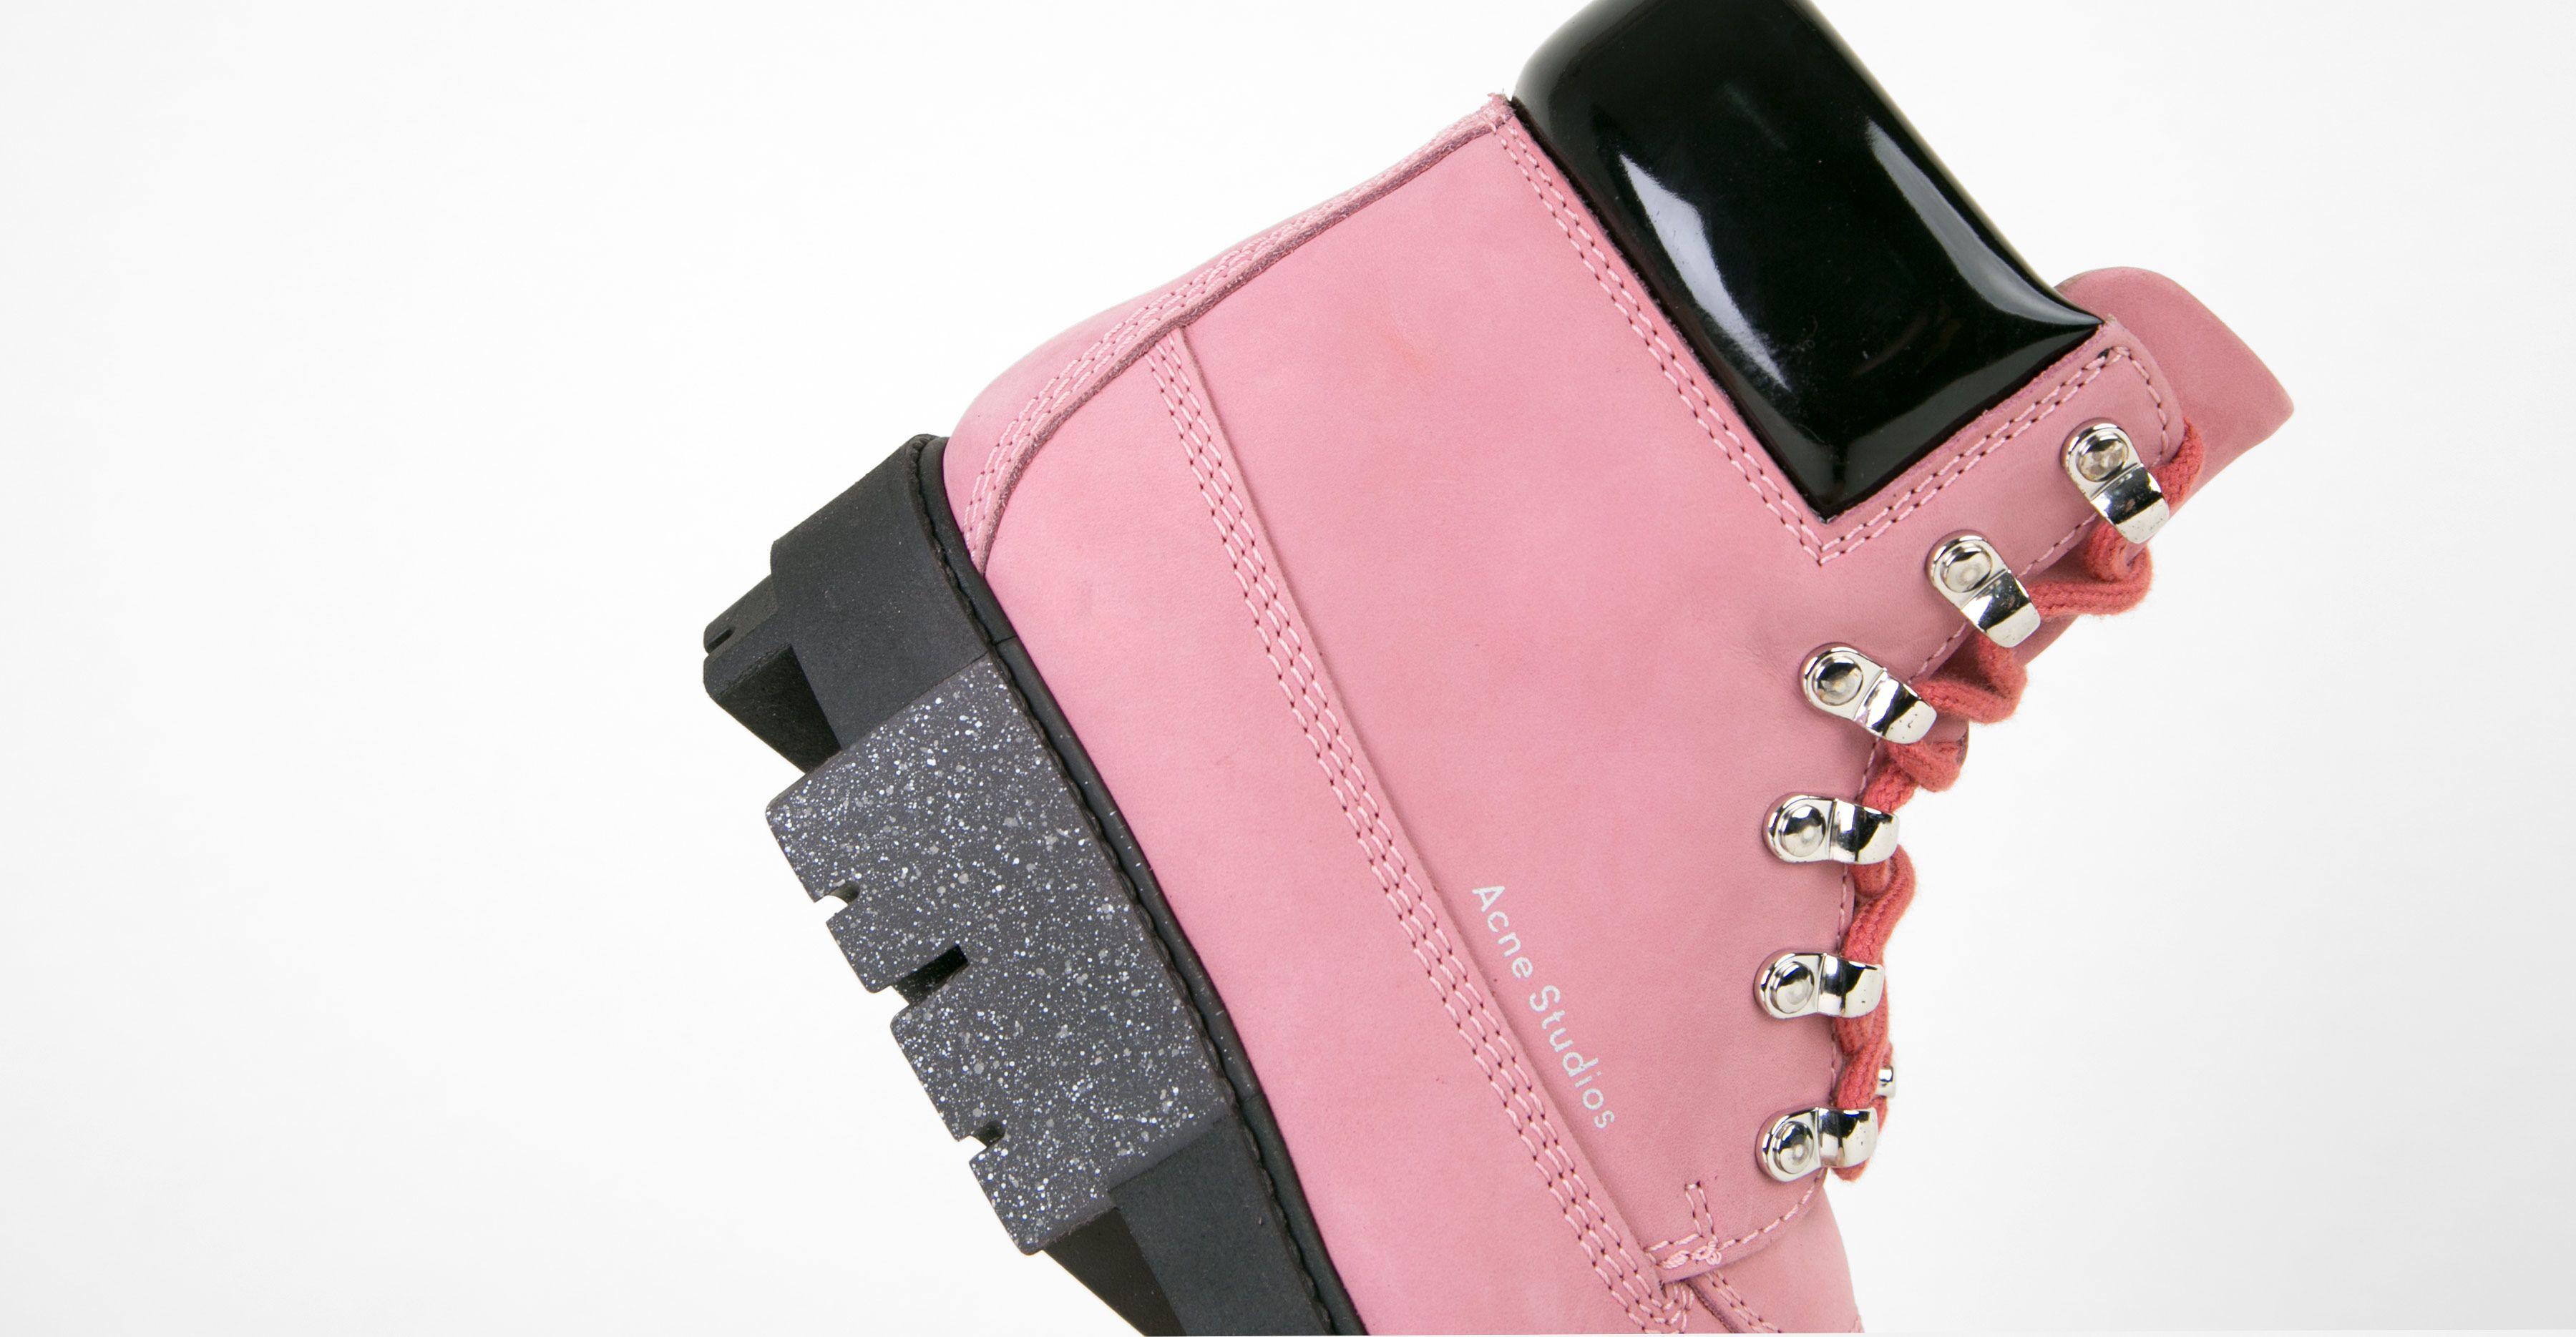 04bef238ed4 acne-studios-telde-boot-bubble-pink-black-4 - UUS TUUS / NEW KEWL